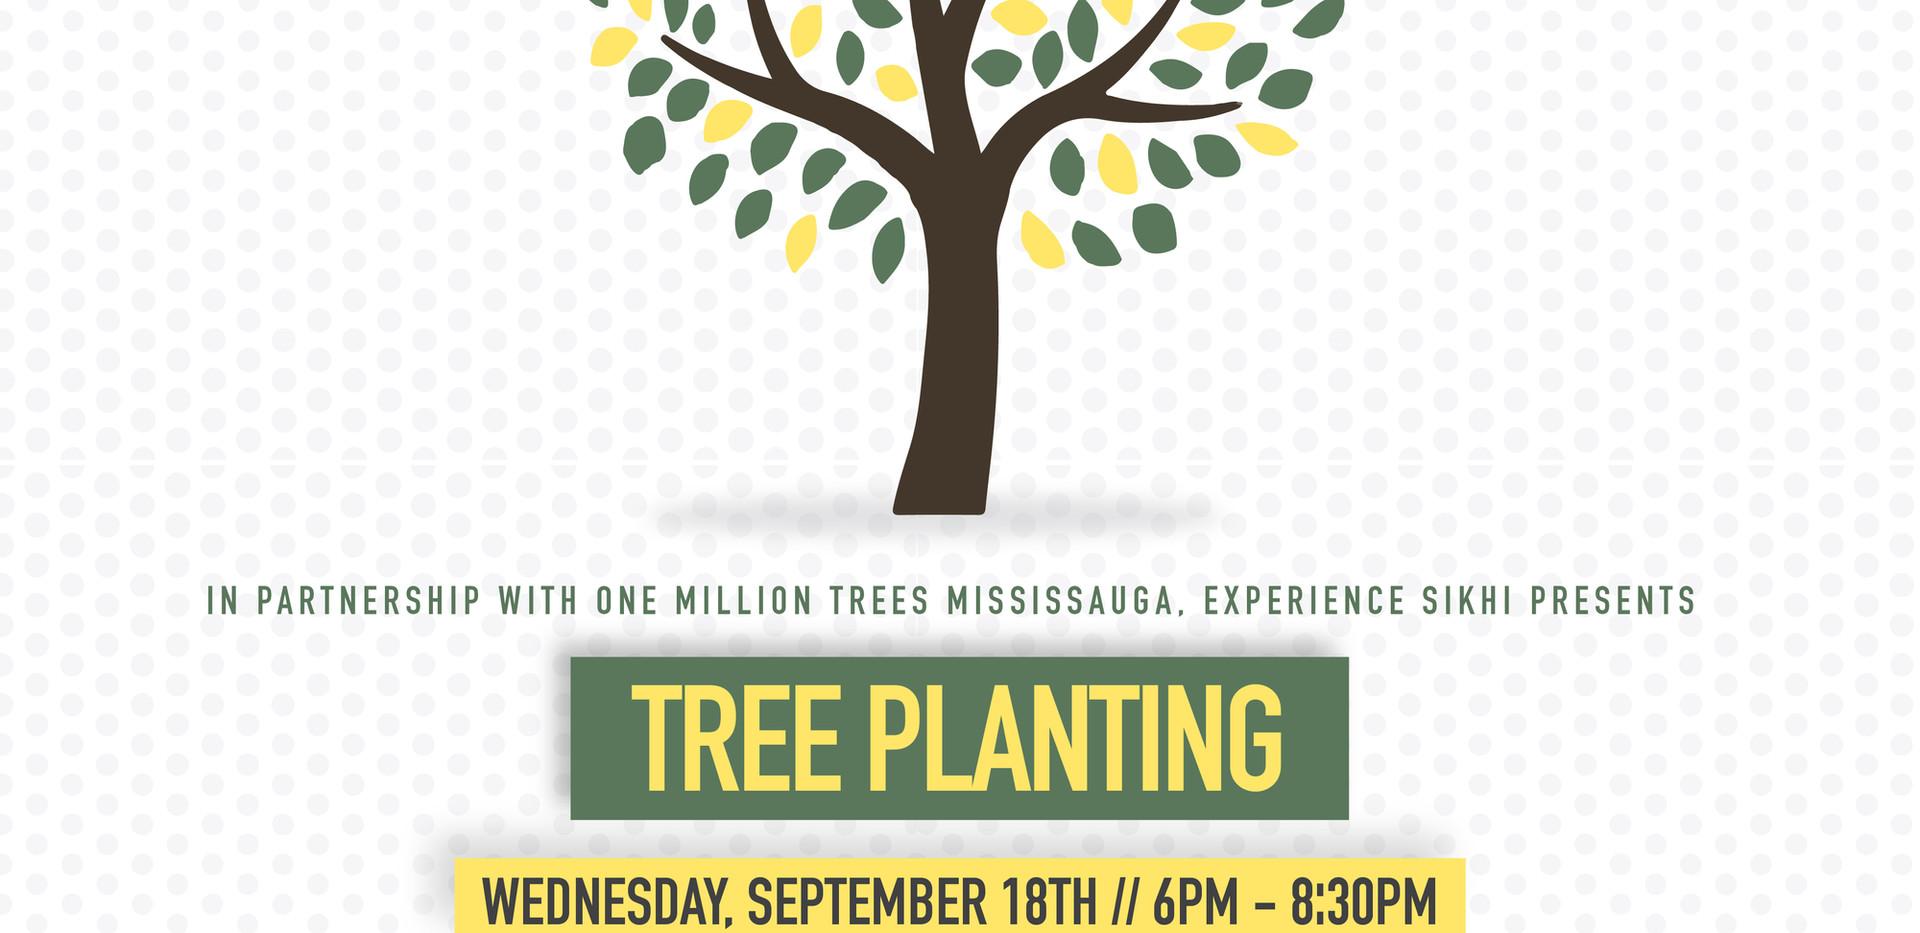 Bhagat Puran Jee Event - Tree Planting